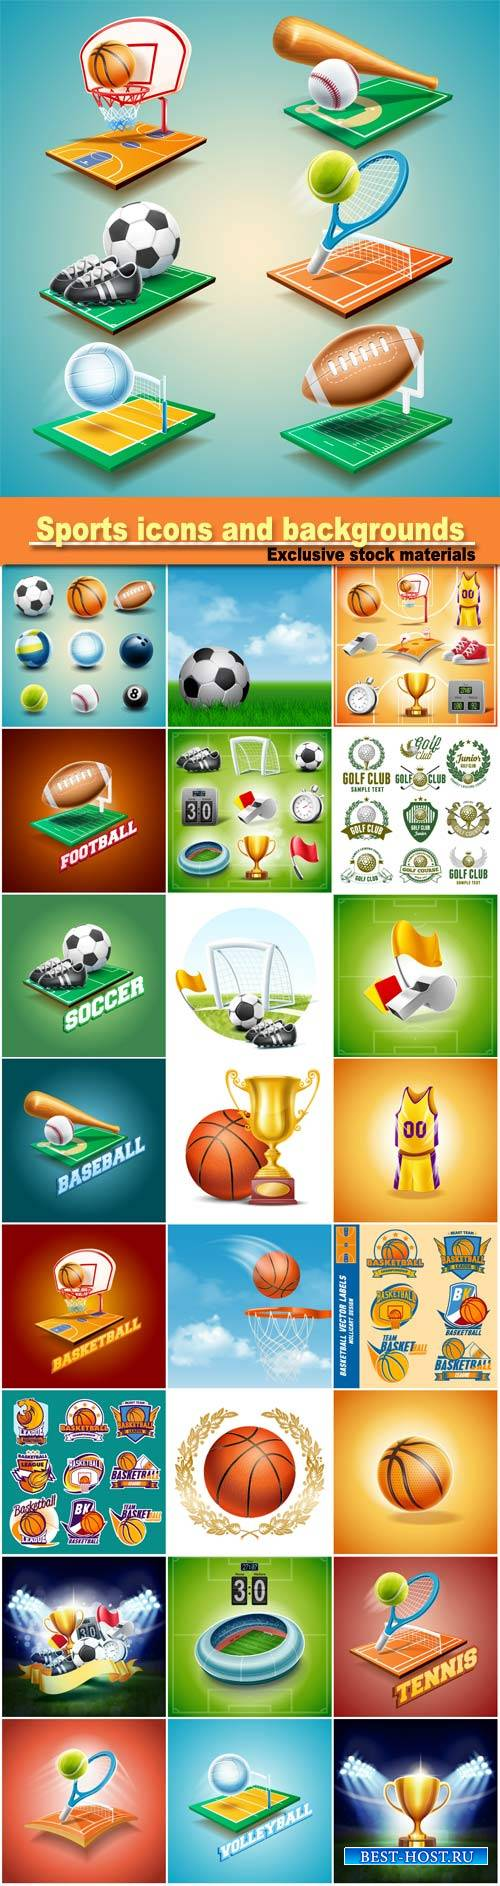 Sports icons and backgrounds vector, football, basketball, golf, baseball